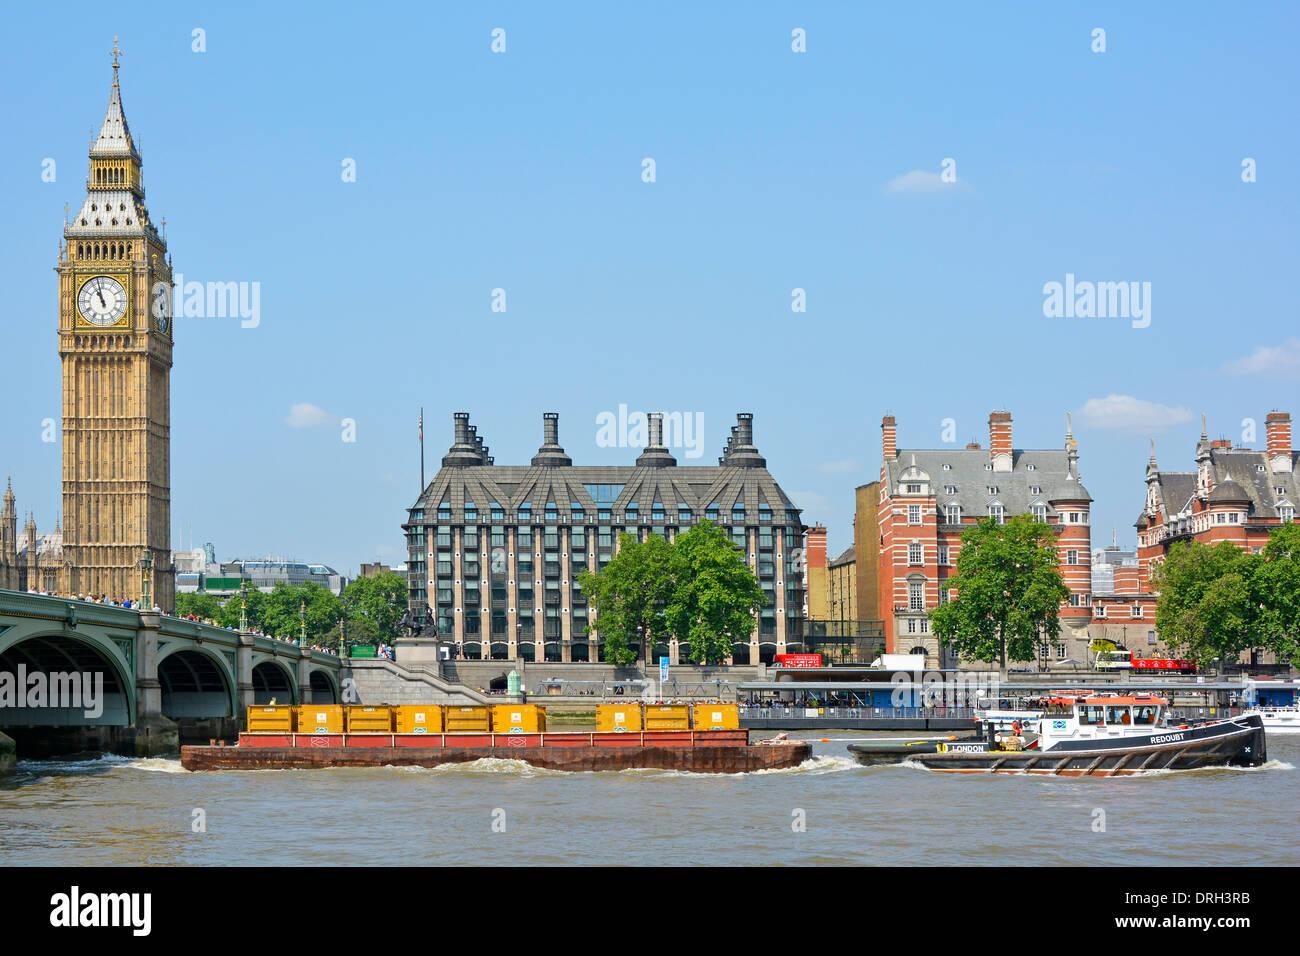 Remolcador tirando barcaza cargados con contenedores llenos de basura pasando Westminster en Londres Foto de stock